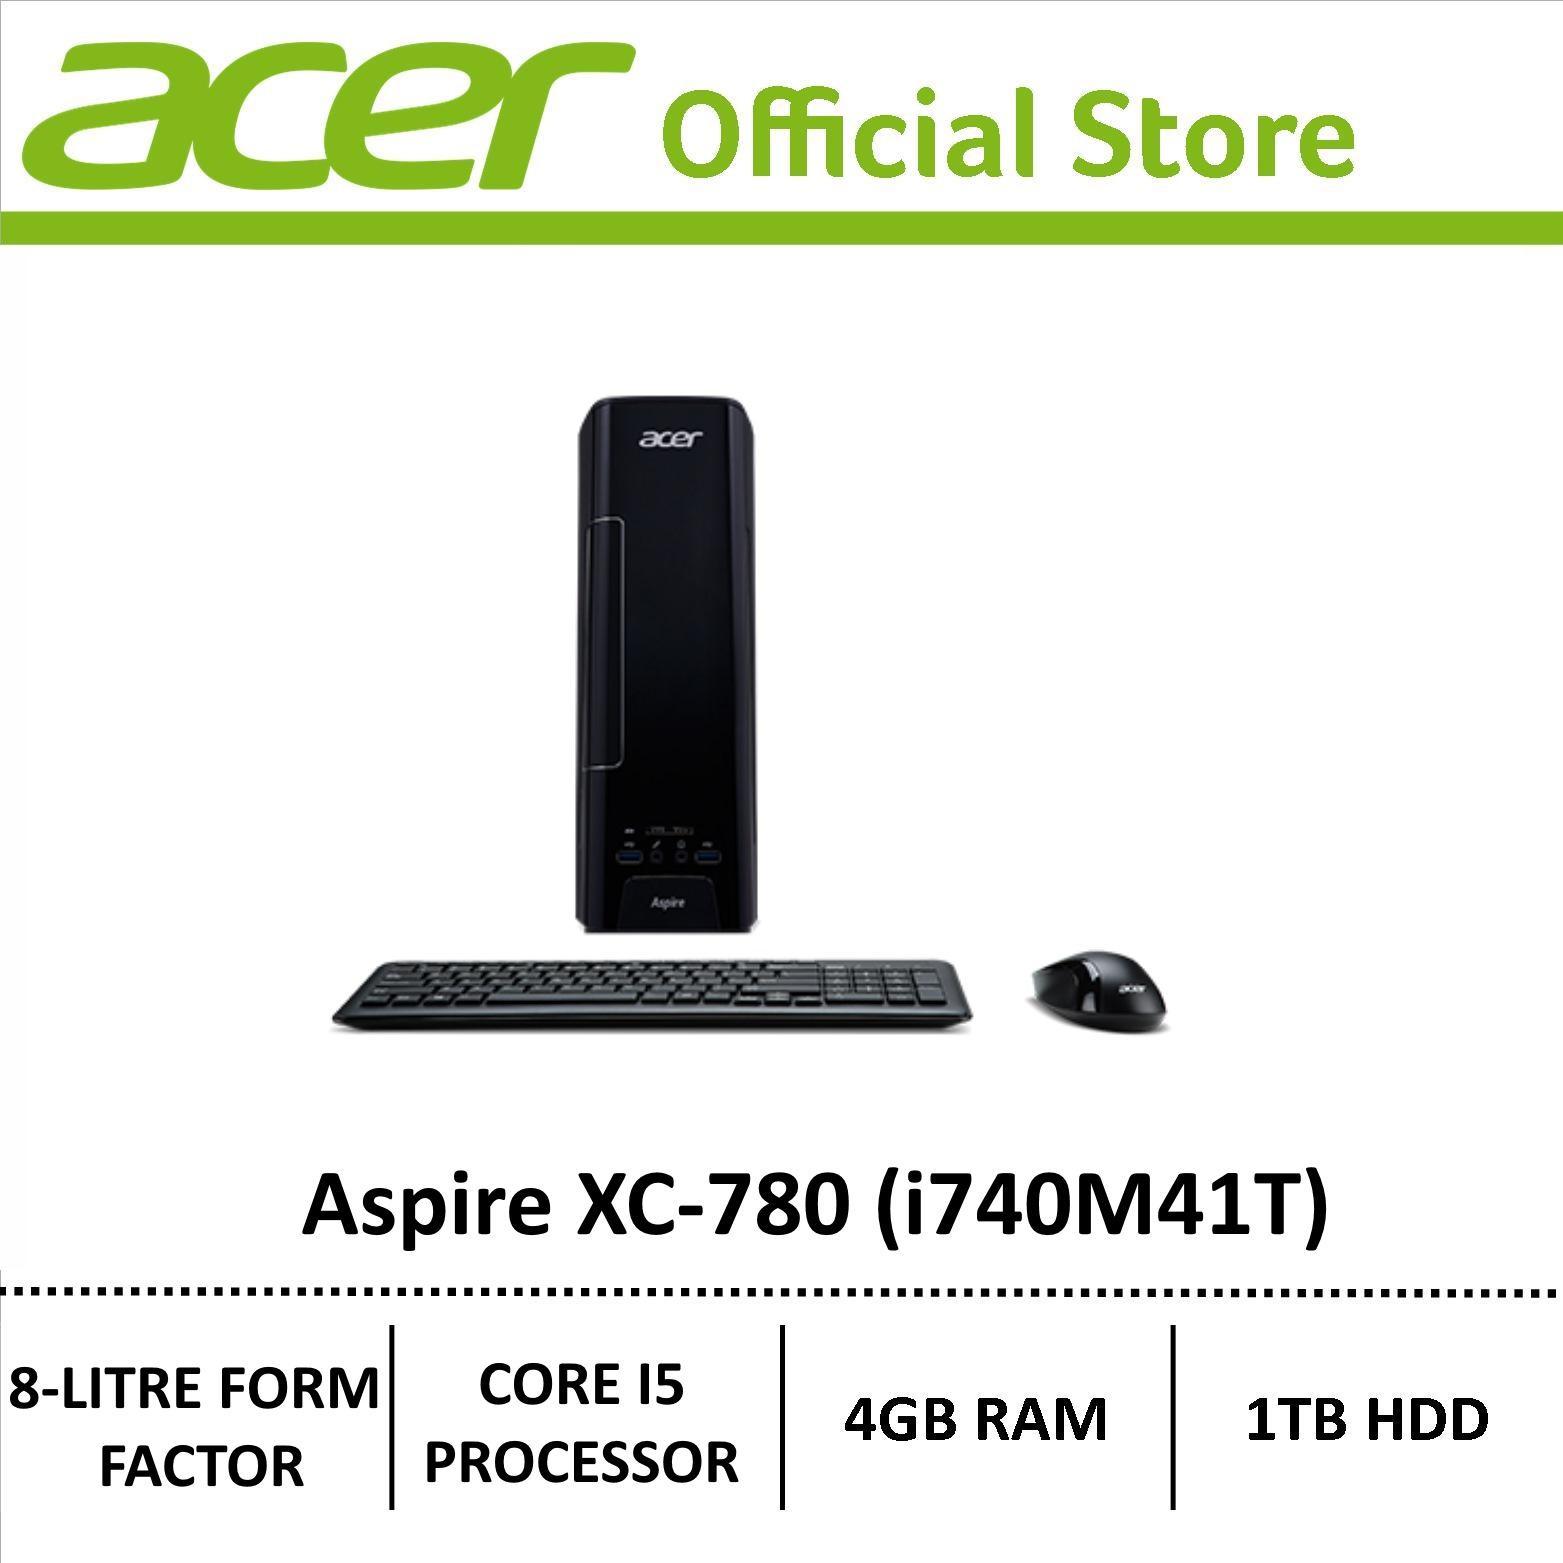 Acer Aspire Xc 780 I740M41T 4Gb Ram 1Tb Hdd Desktop Black Singapore